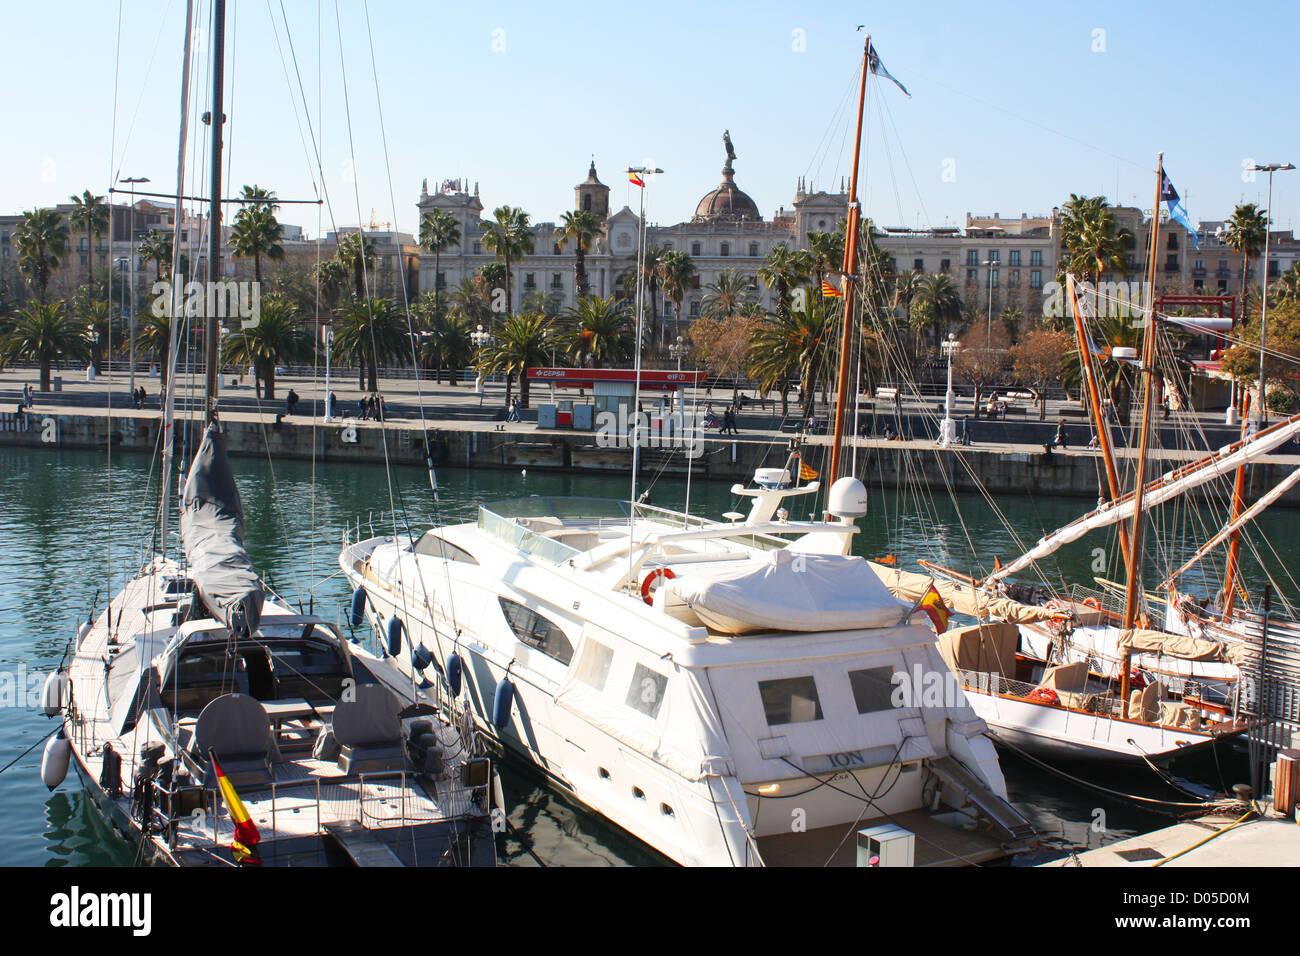 Boats in Barcelona city, Spain Stock Photo